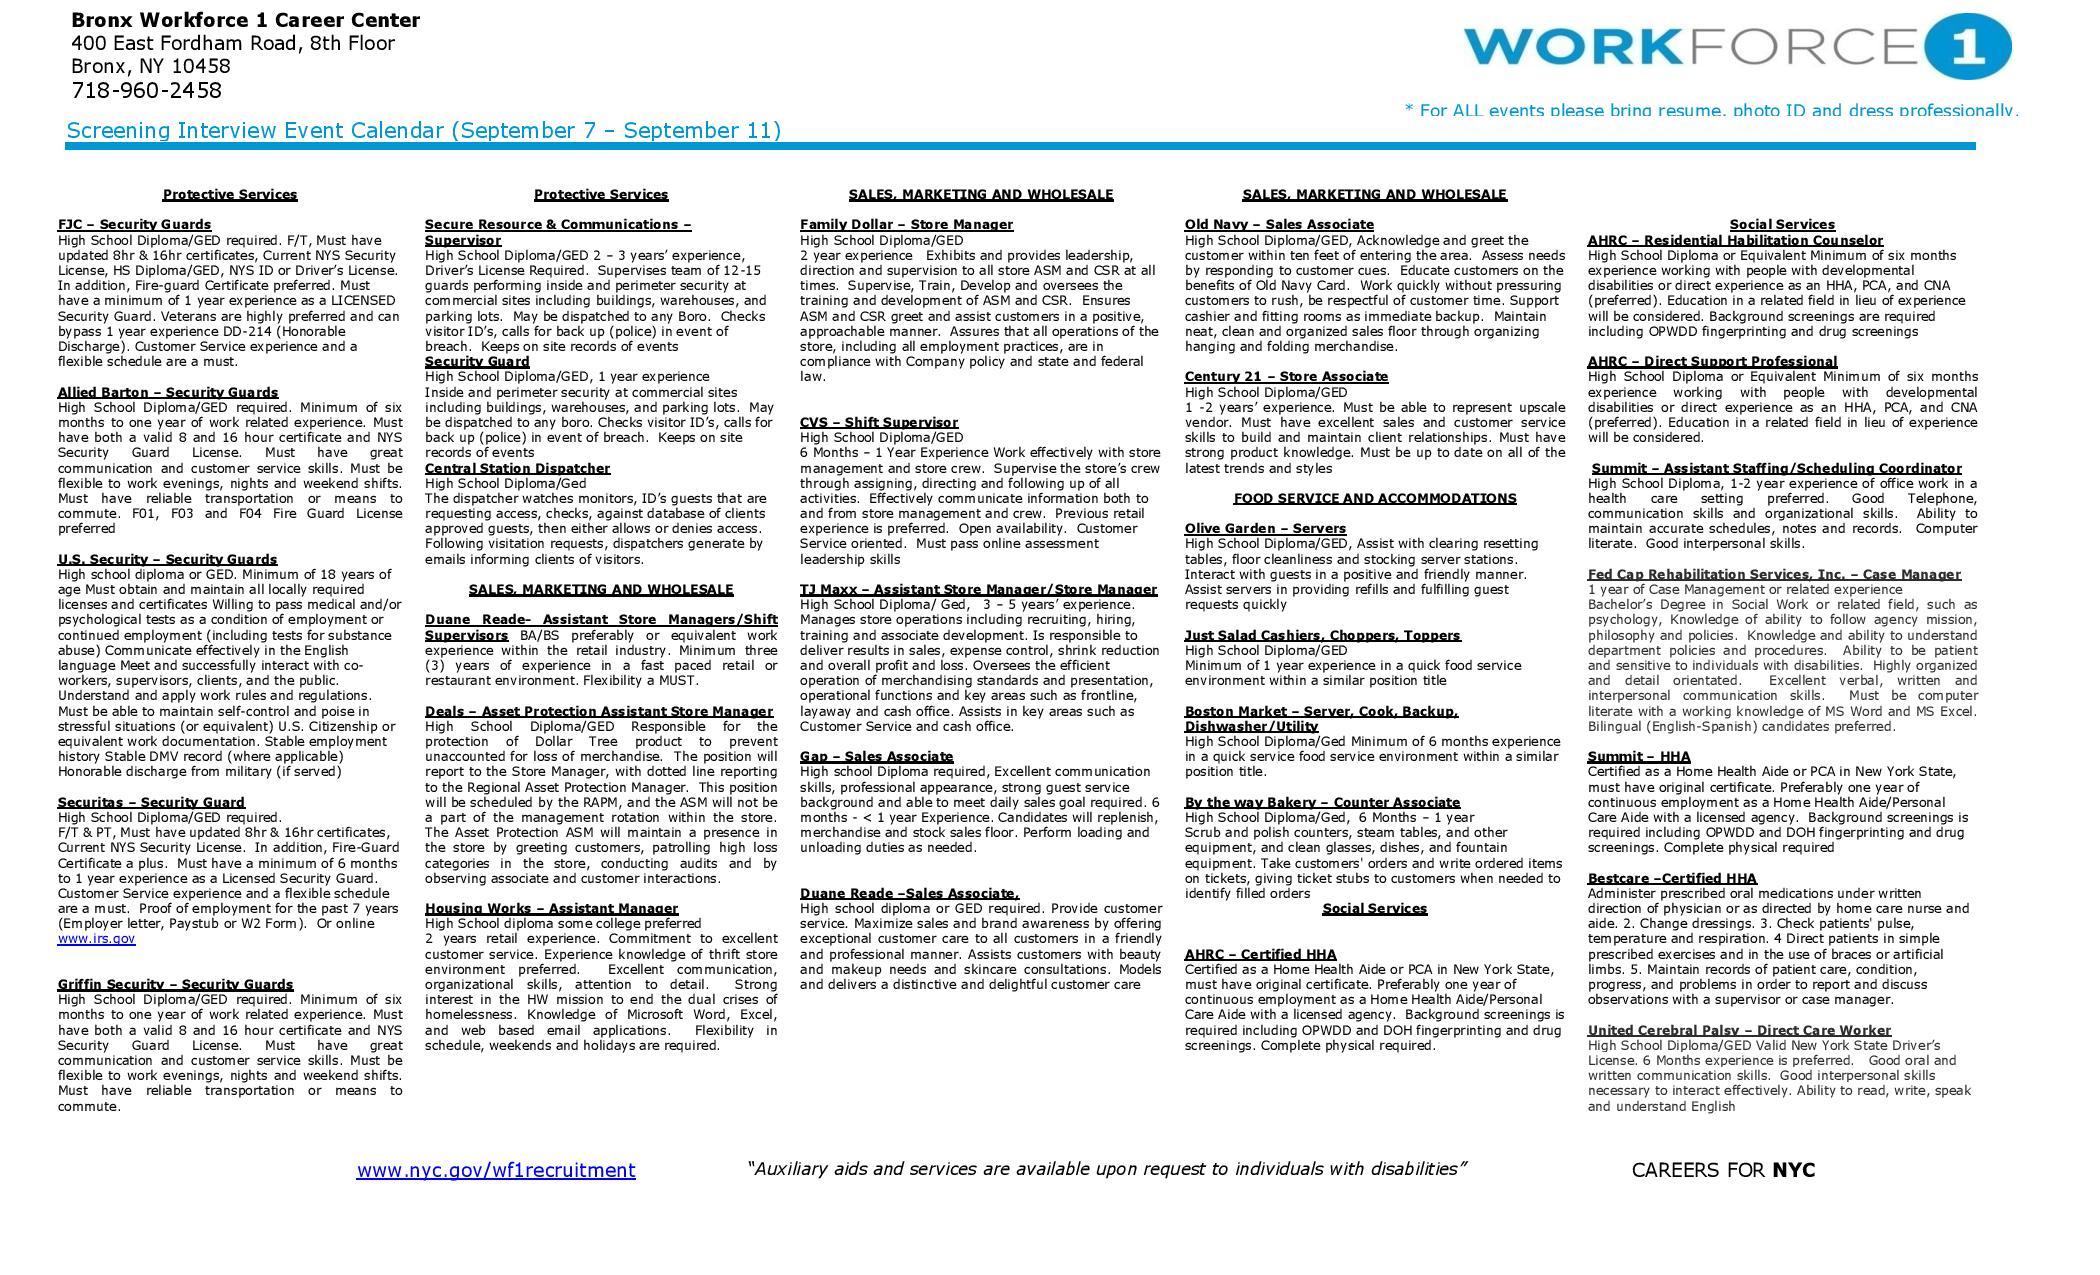 work | New York City Council Member Fernando Cabrera | Page 4